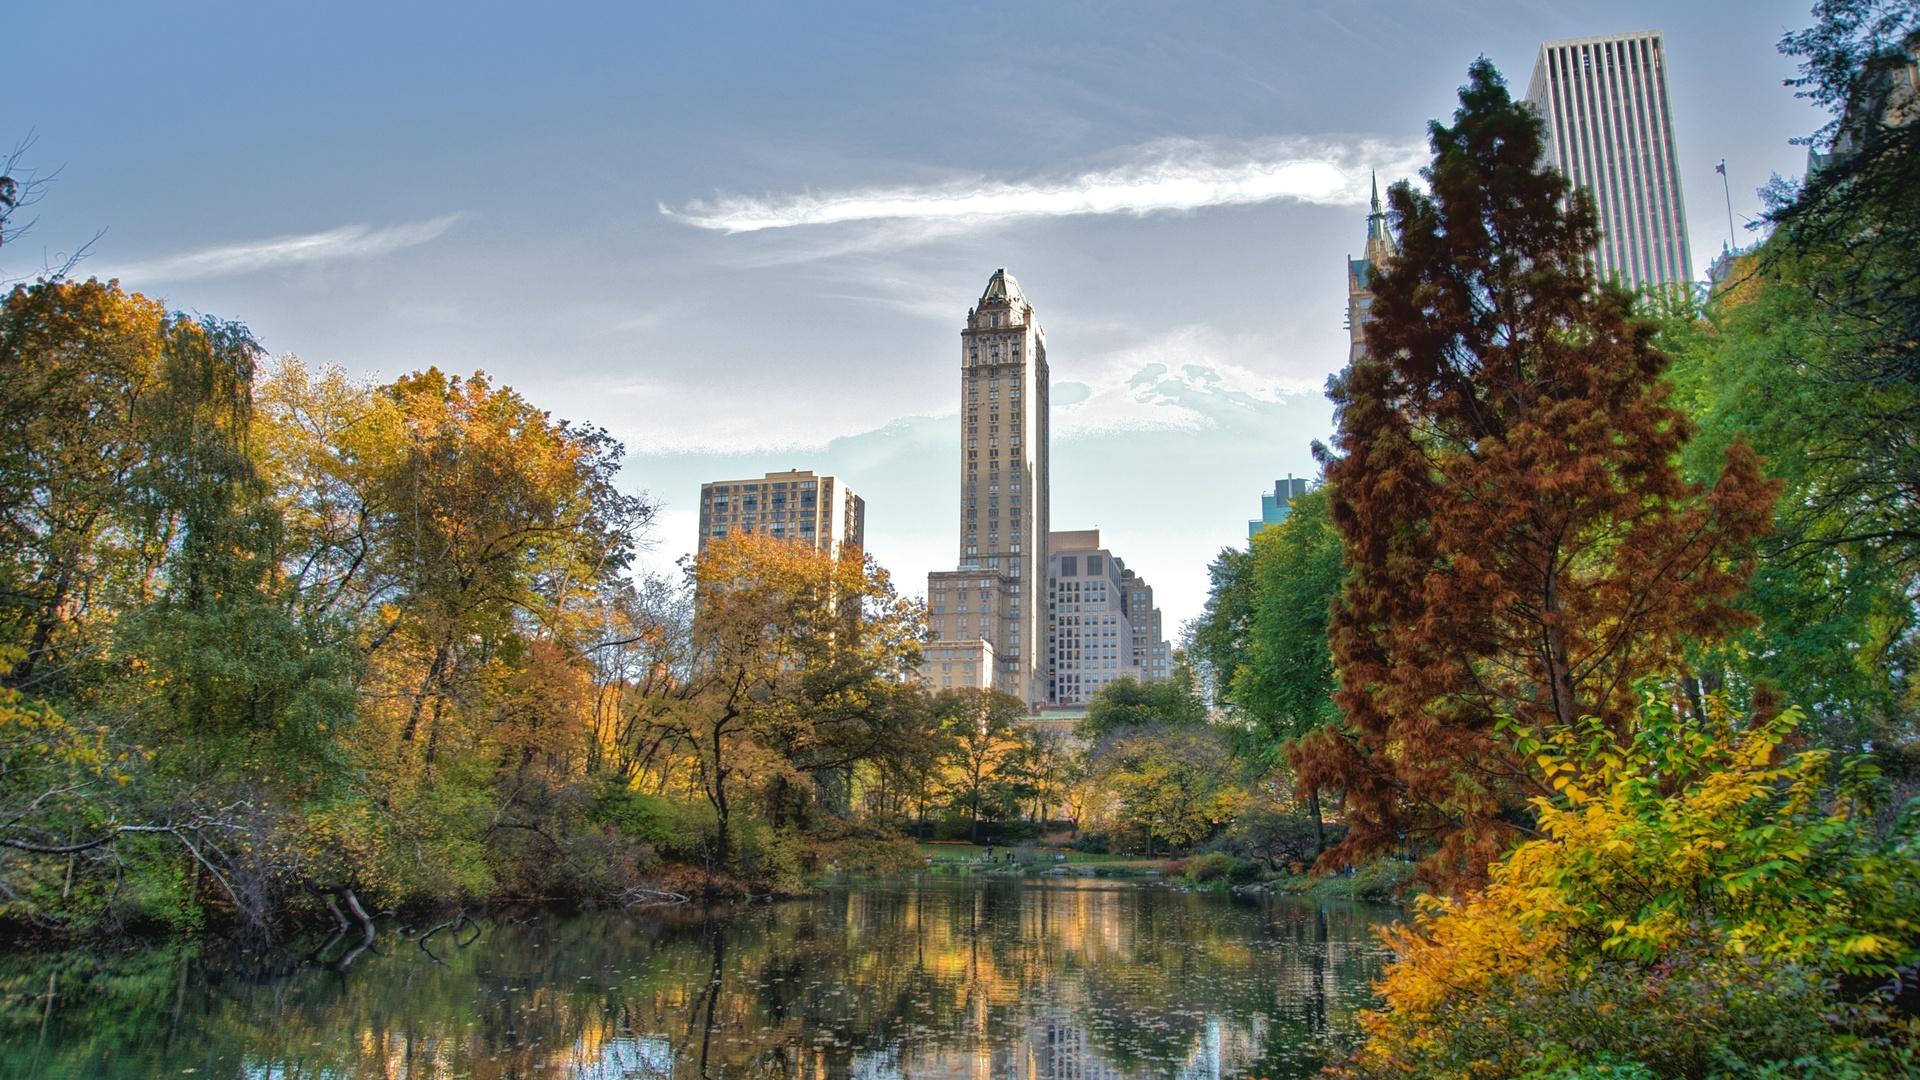 центральный парк, New york, central park, озеро, нью-йорк